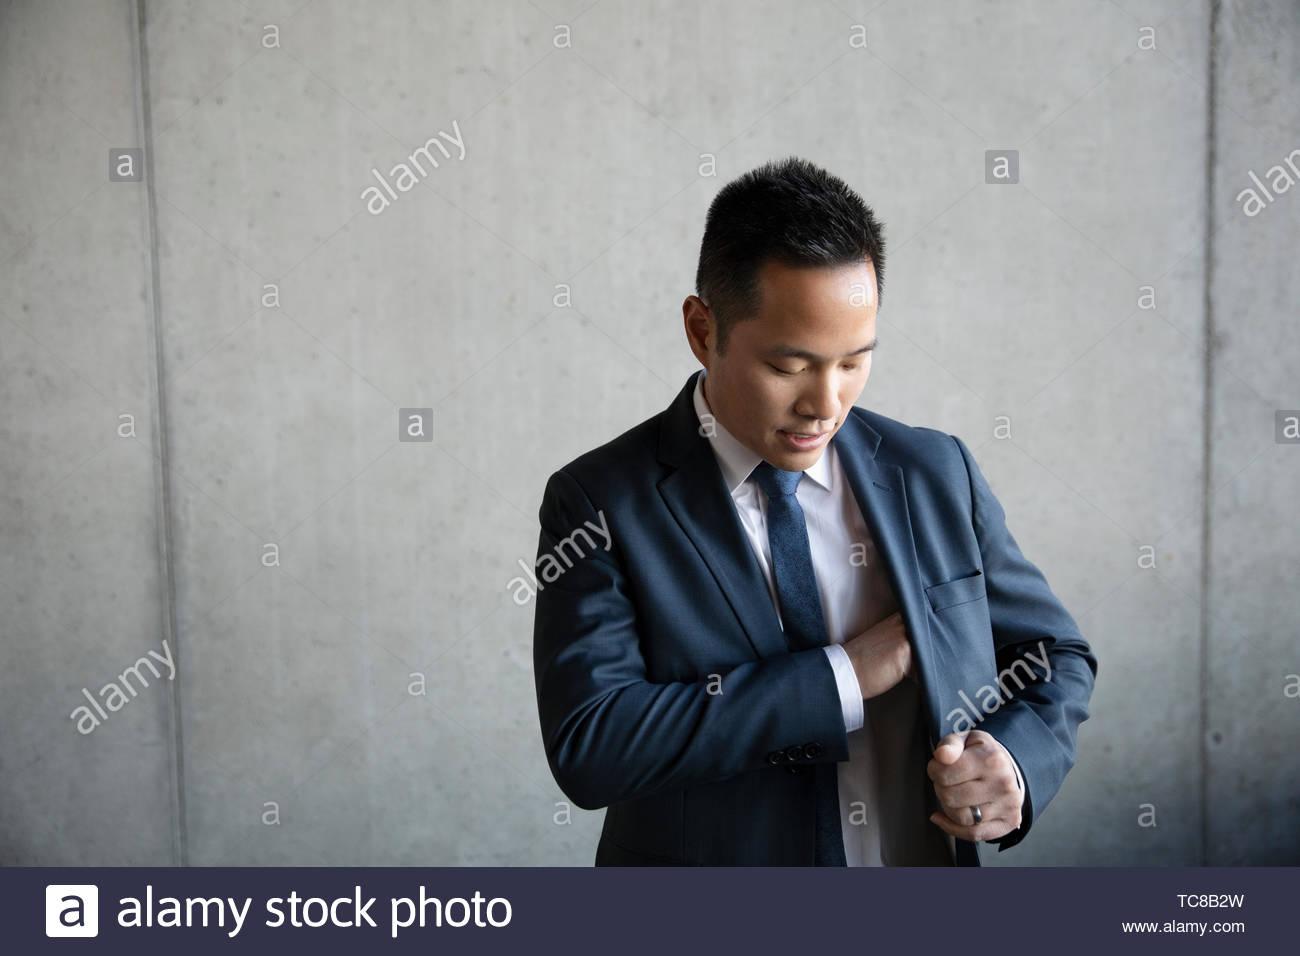 Businessman reaching inside suit jacket pocket - Stock Image